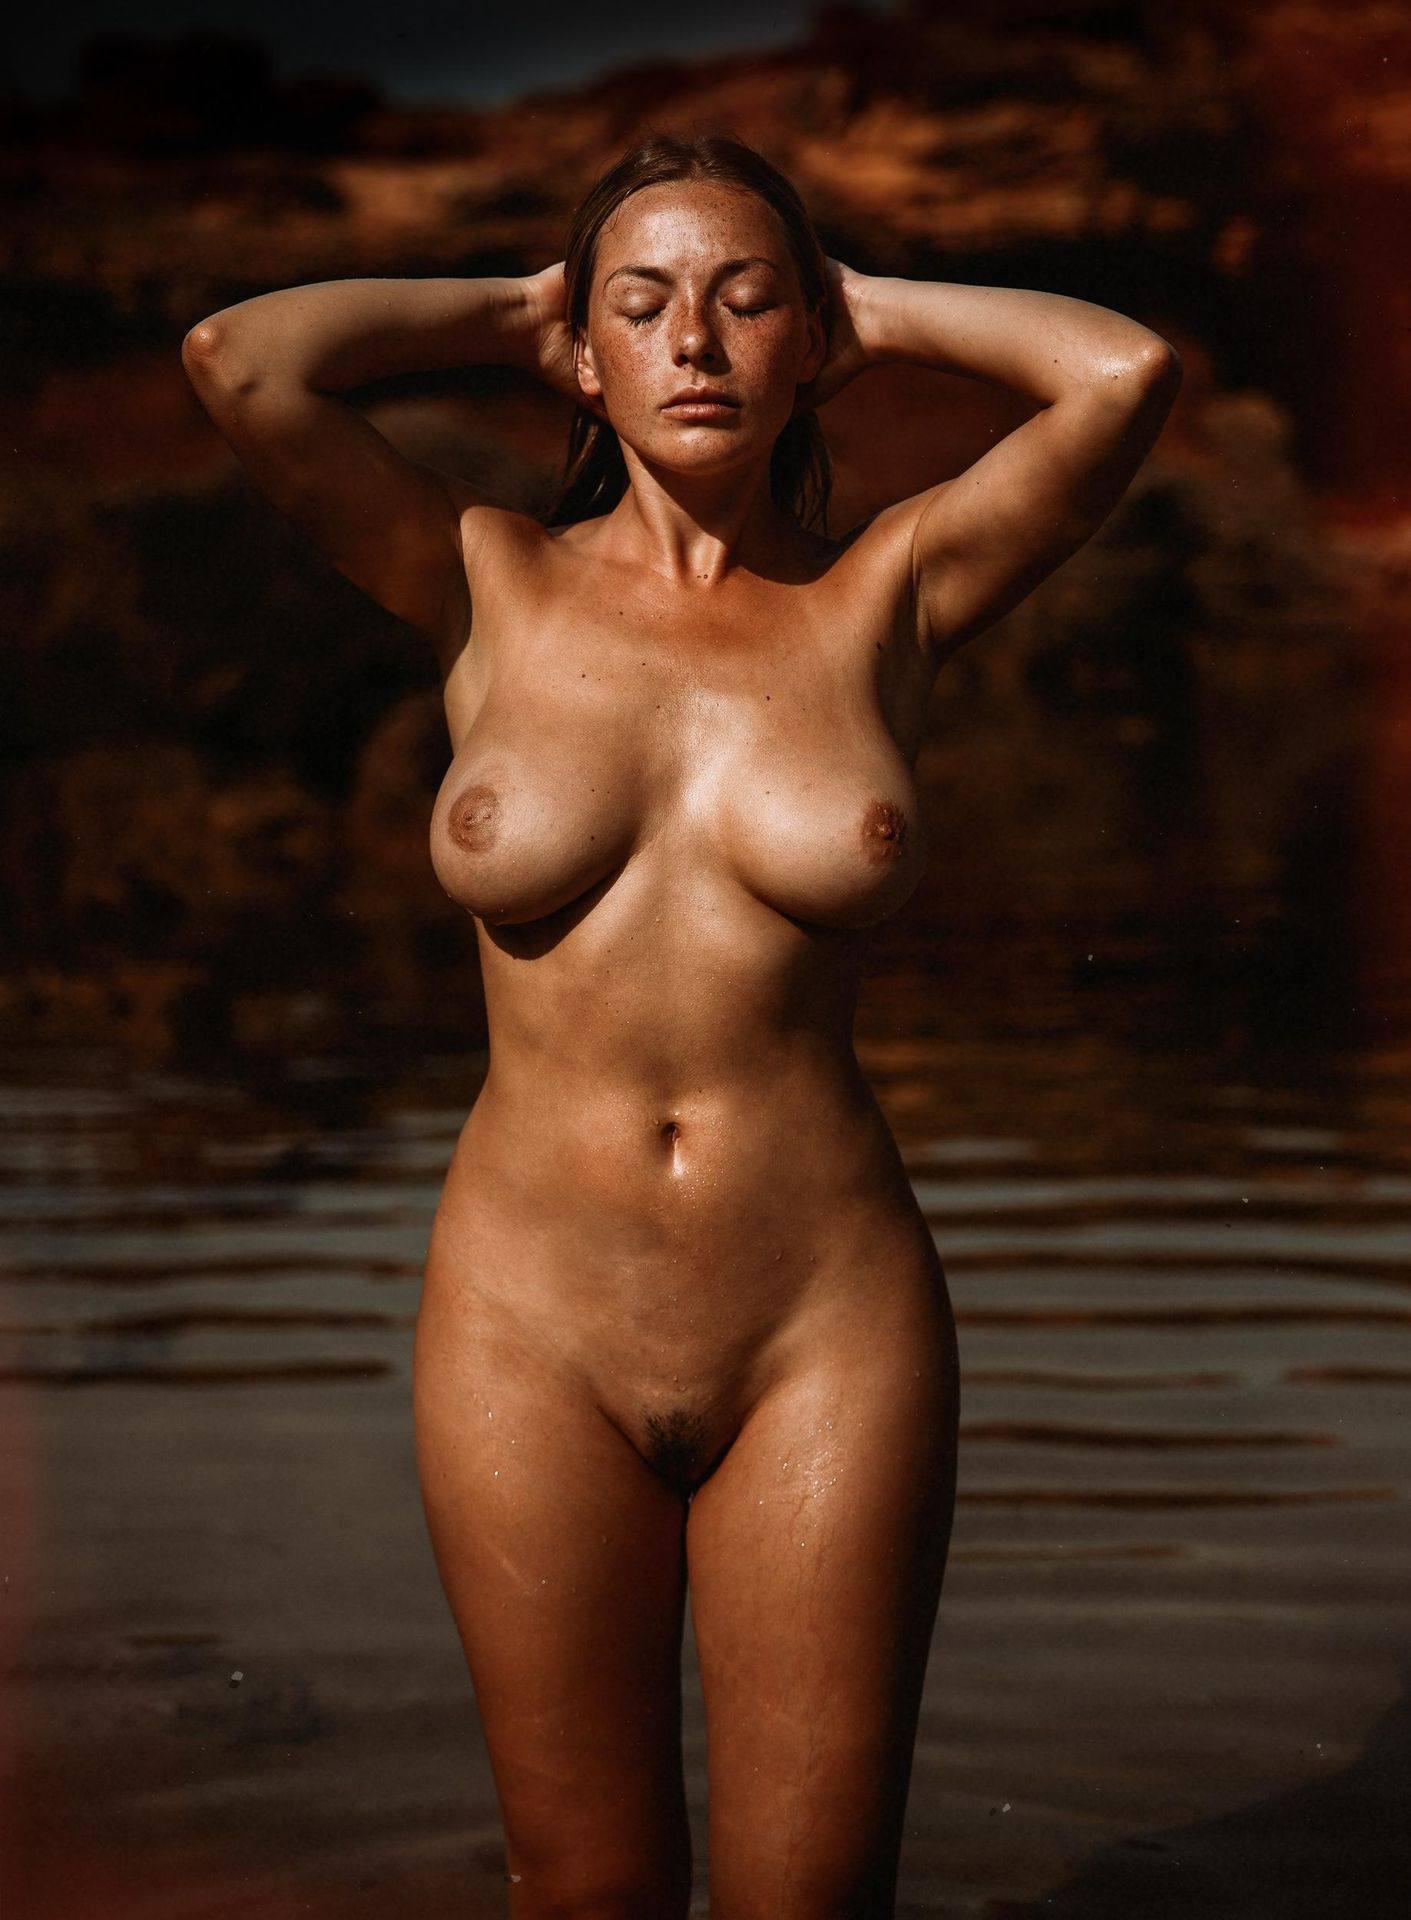 Olga Kobzar – Hot Big Boobs In Sexy Full Frontal Nude Photoshoot By Thomas Agatz (nsfw) 0002